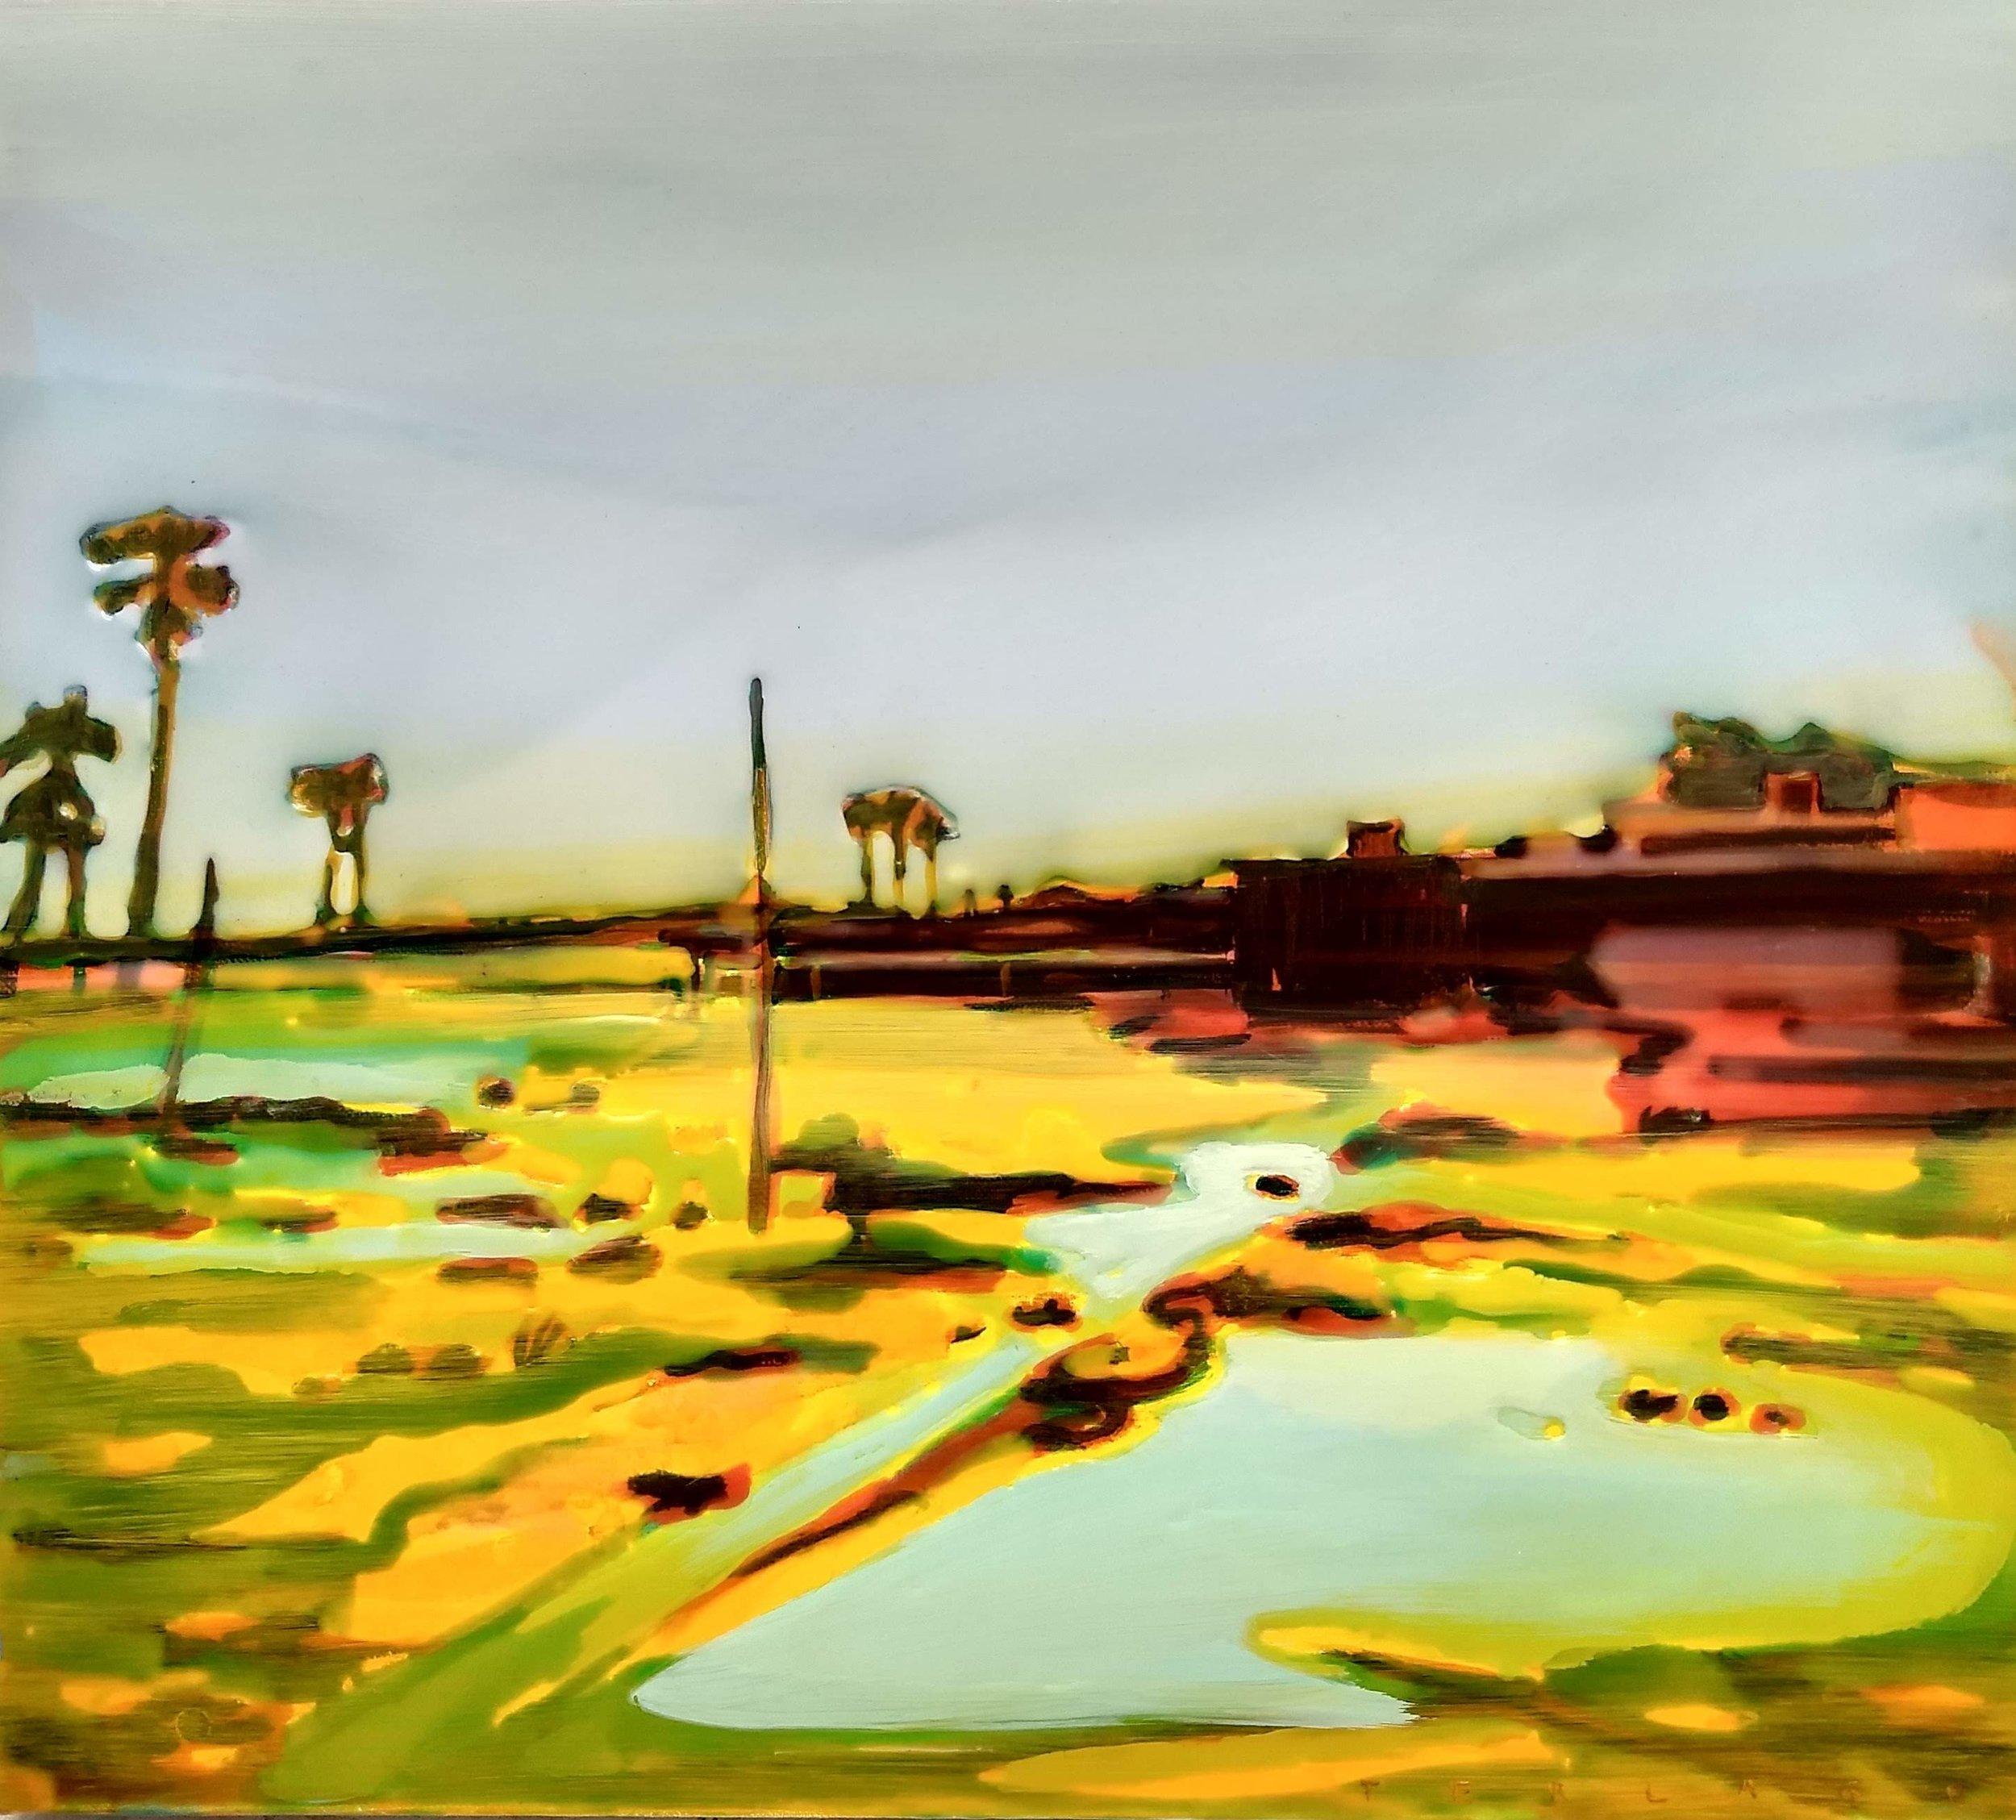 SWAMP  40 x 45 cm Acrylic and epoxy on canvas